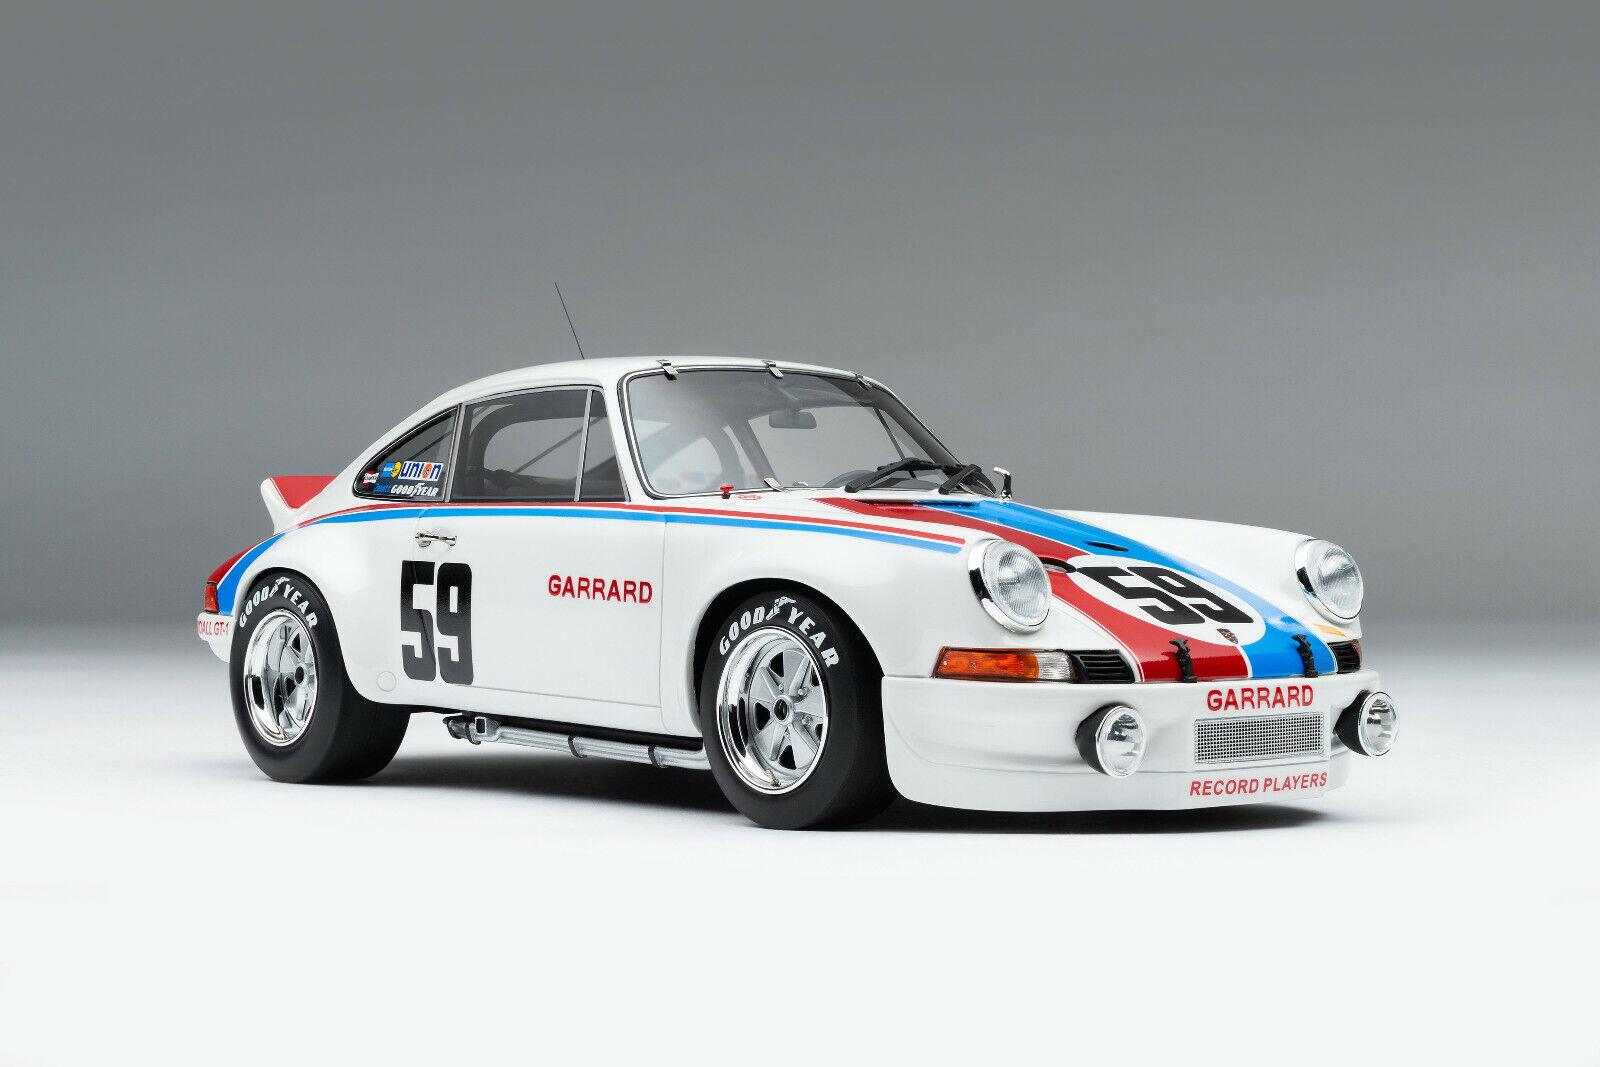 Porsche 911 rsr 2.8 Brumos daytona hurley haywood amalgama 1 18 como Exoto cmc